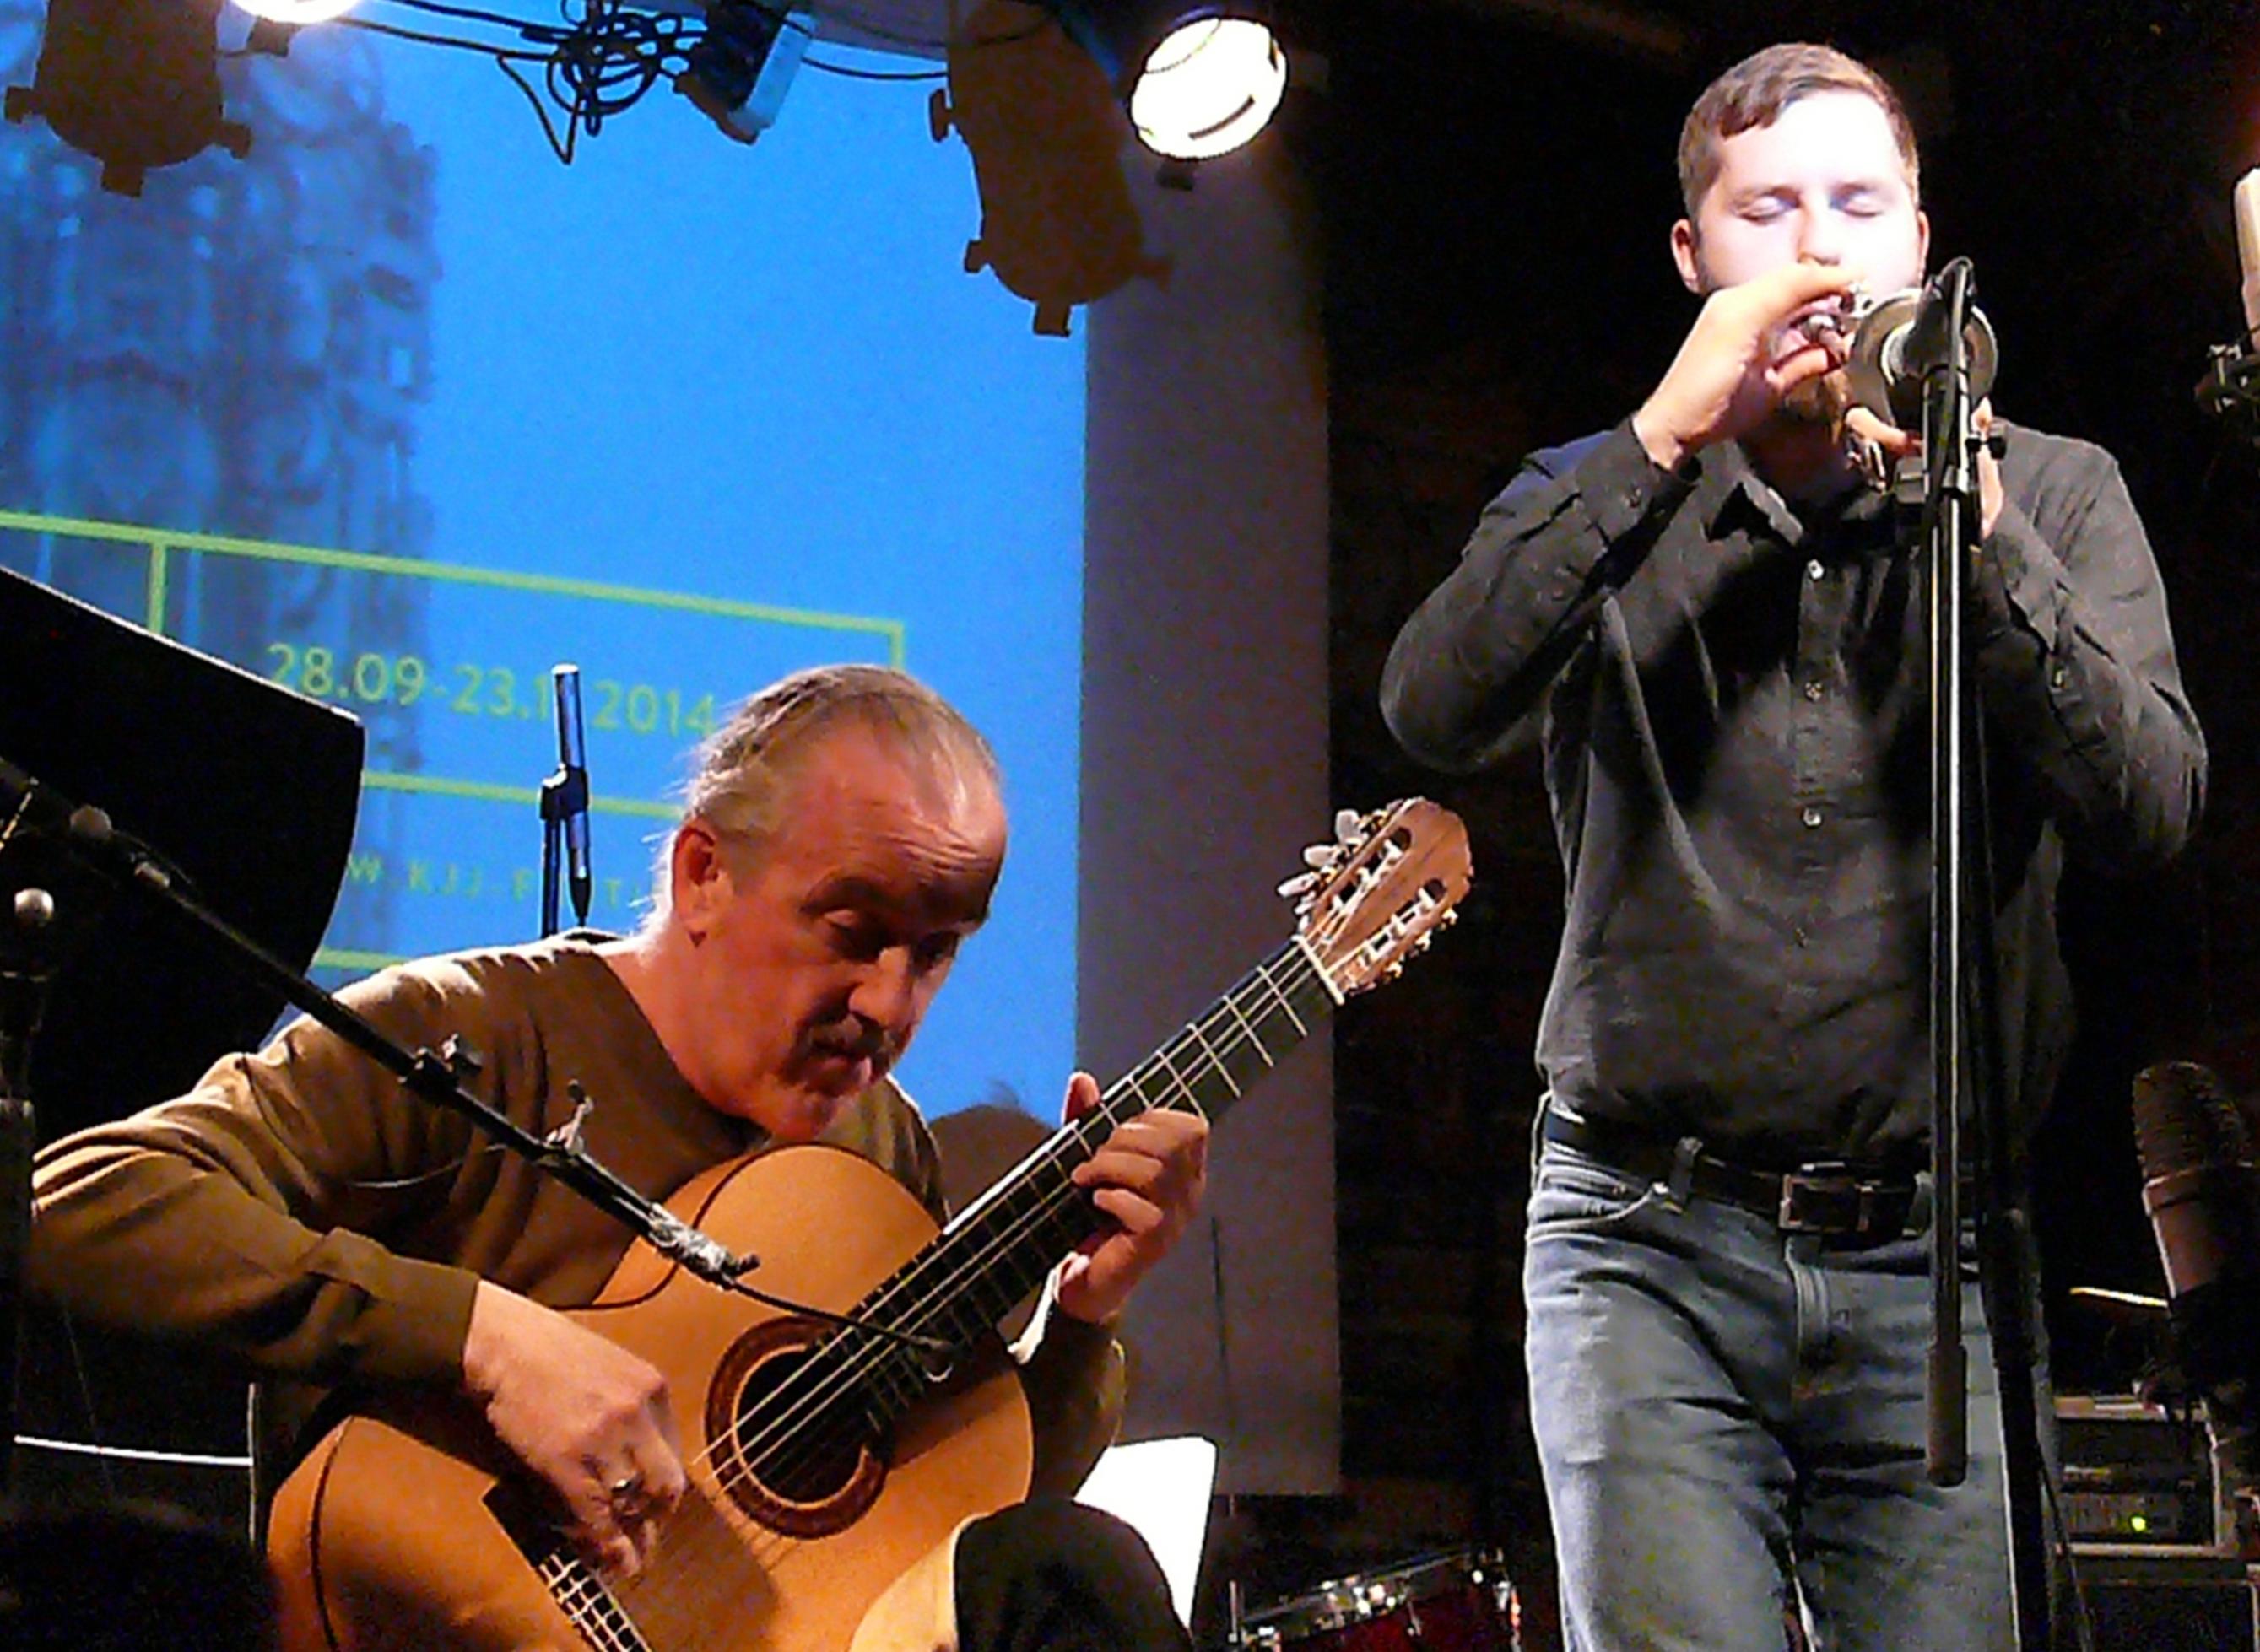 Ben Dwyer and Peter Evans at Alchemia, Krakow in November 2014